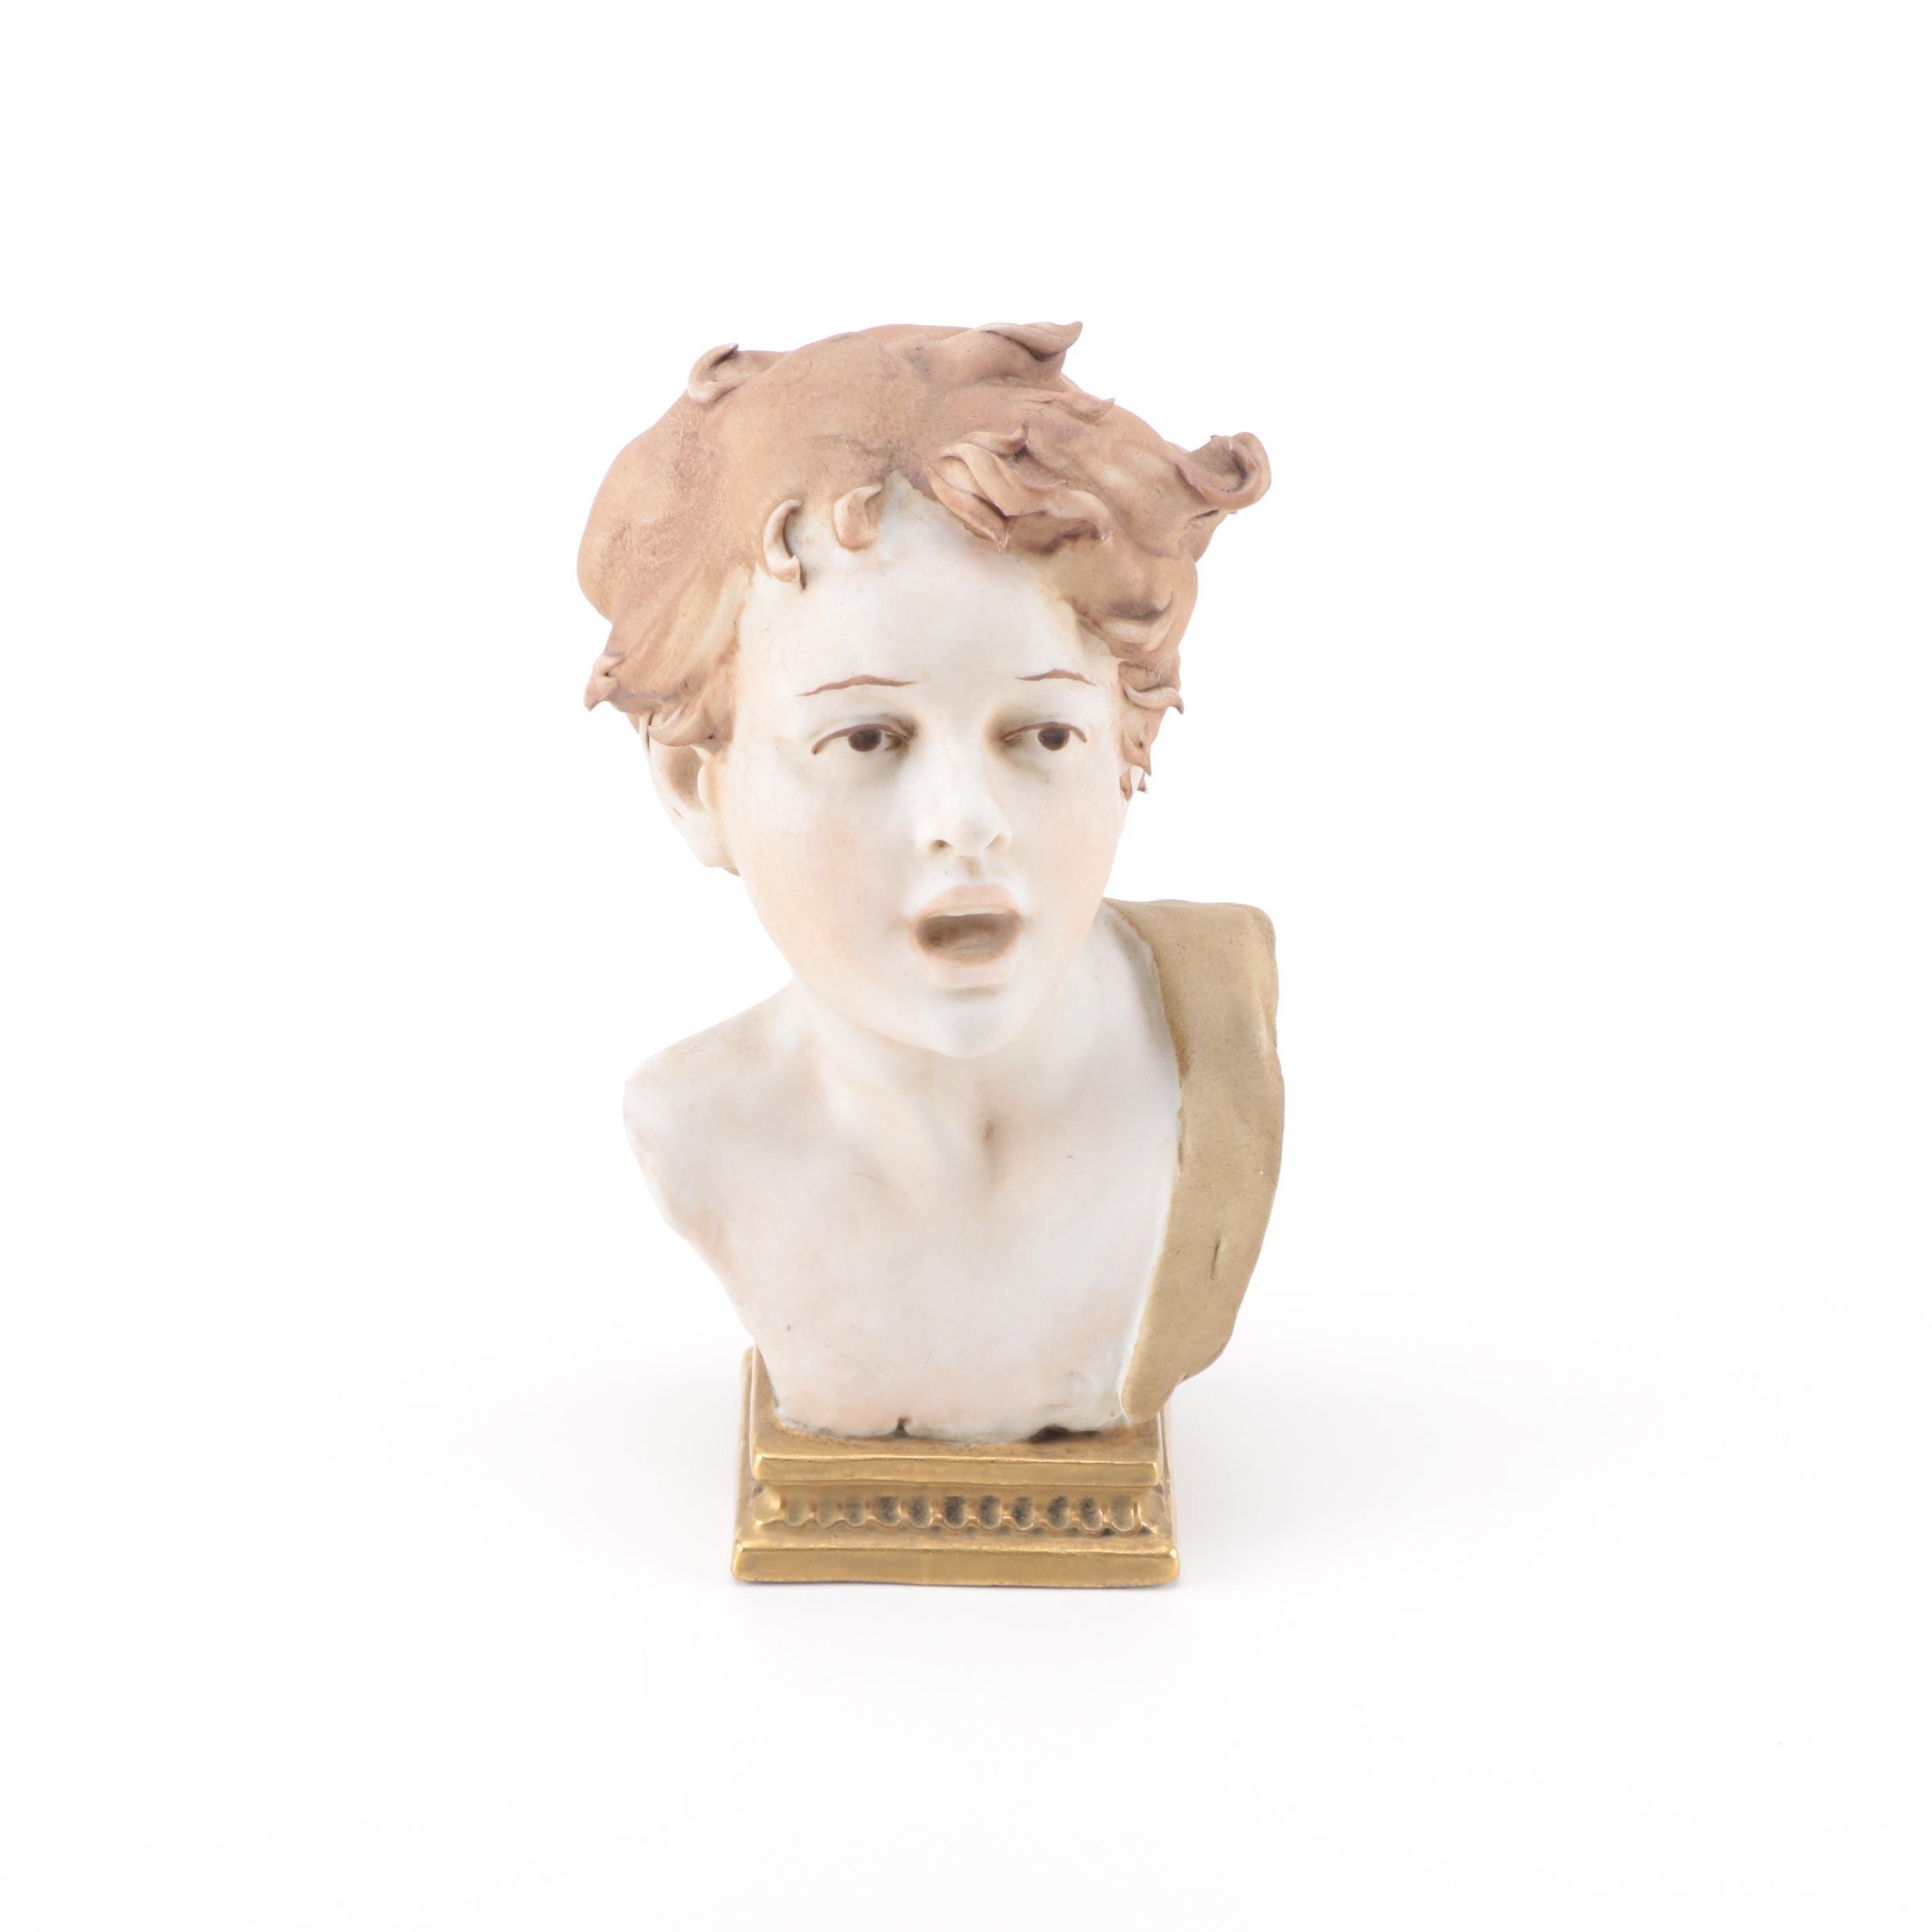 Antique Luigi Benacchio Hand Painted Italian Bisque Bust of a Boy